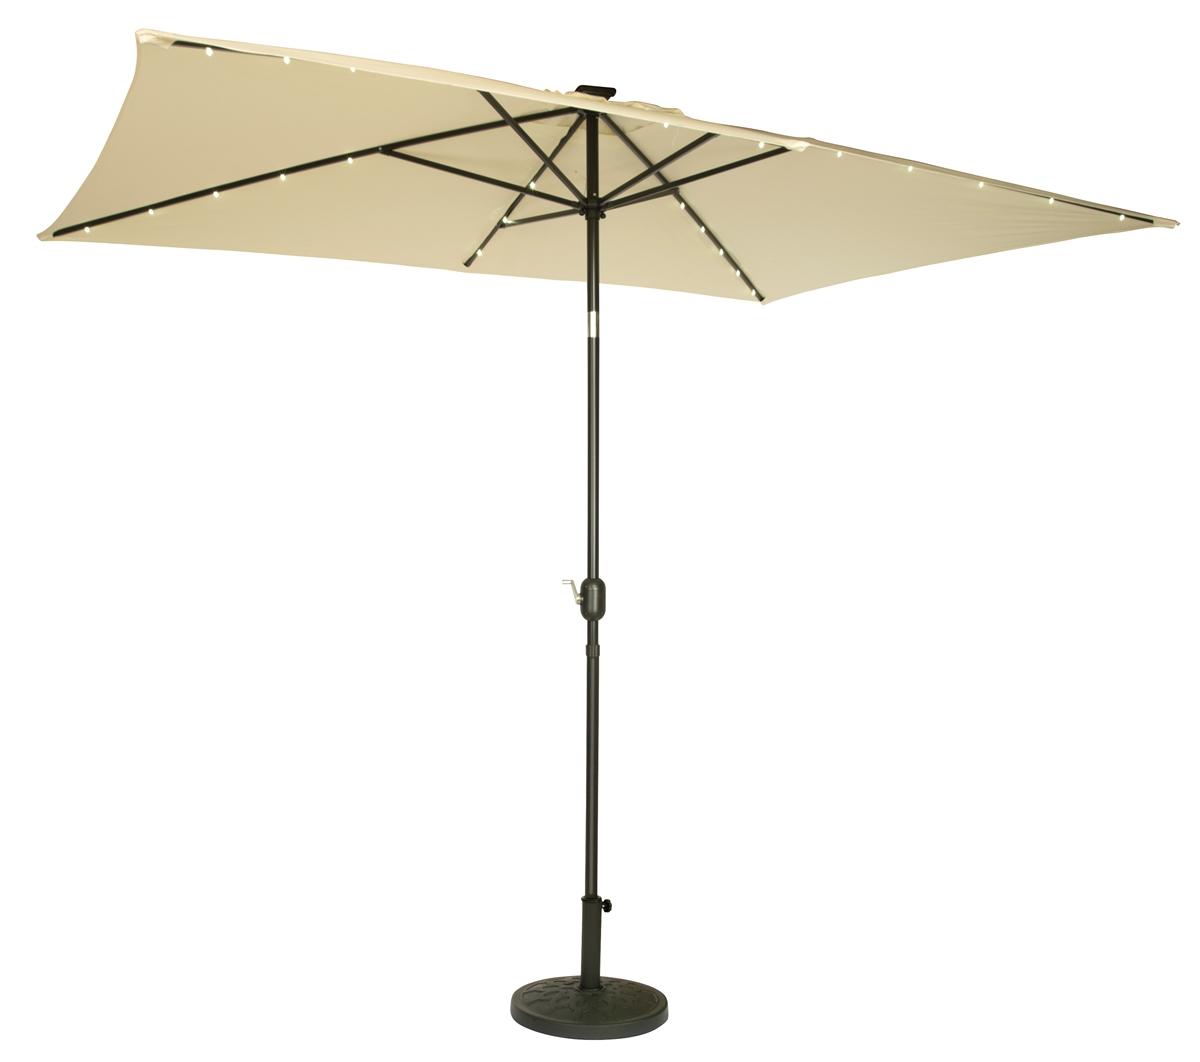 10u0027 X 6.5u0027 Rectangular Solar Powered LED Lighted Patio Umbrella By  Trademark Innovations (Beige)